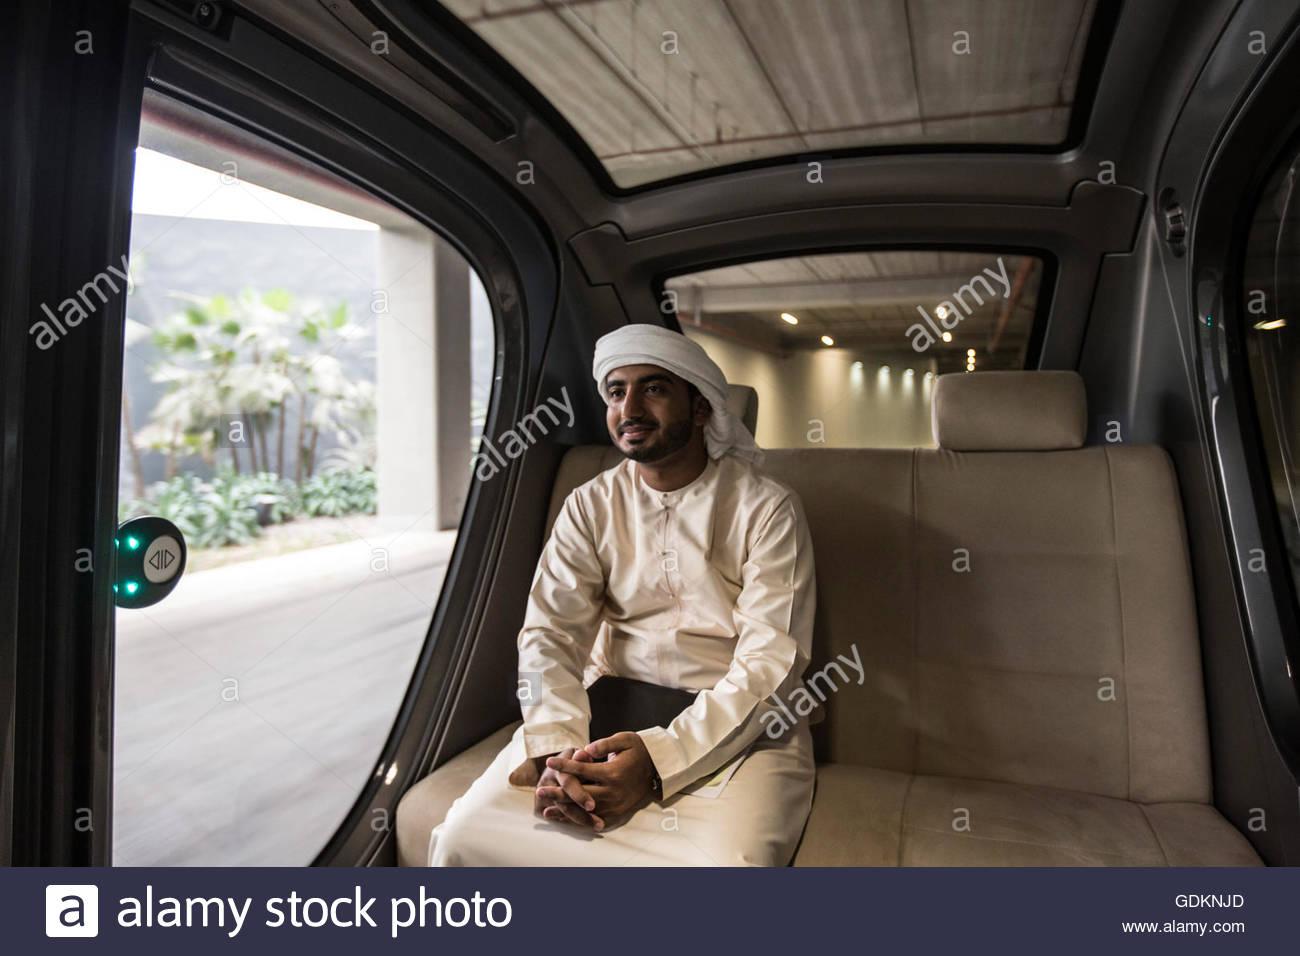 Ein Emirati Student Ankunft am Masdar Institute of Science and Technology, die seit 2010, Abu Dhabi, VAE tätig Stockbild